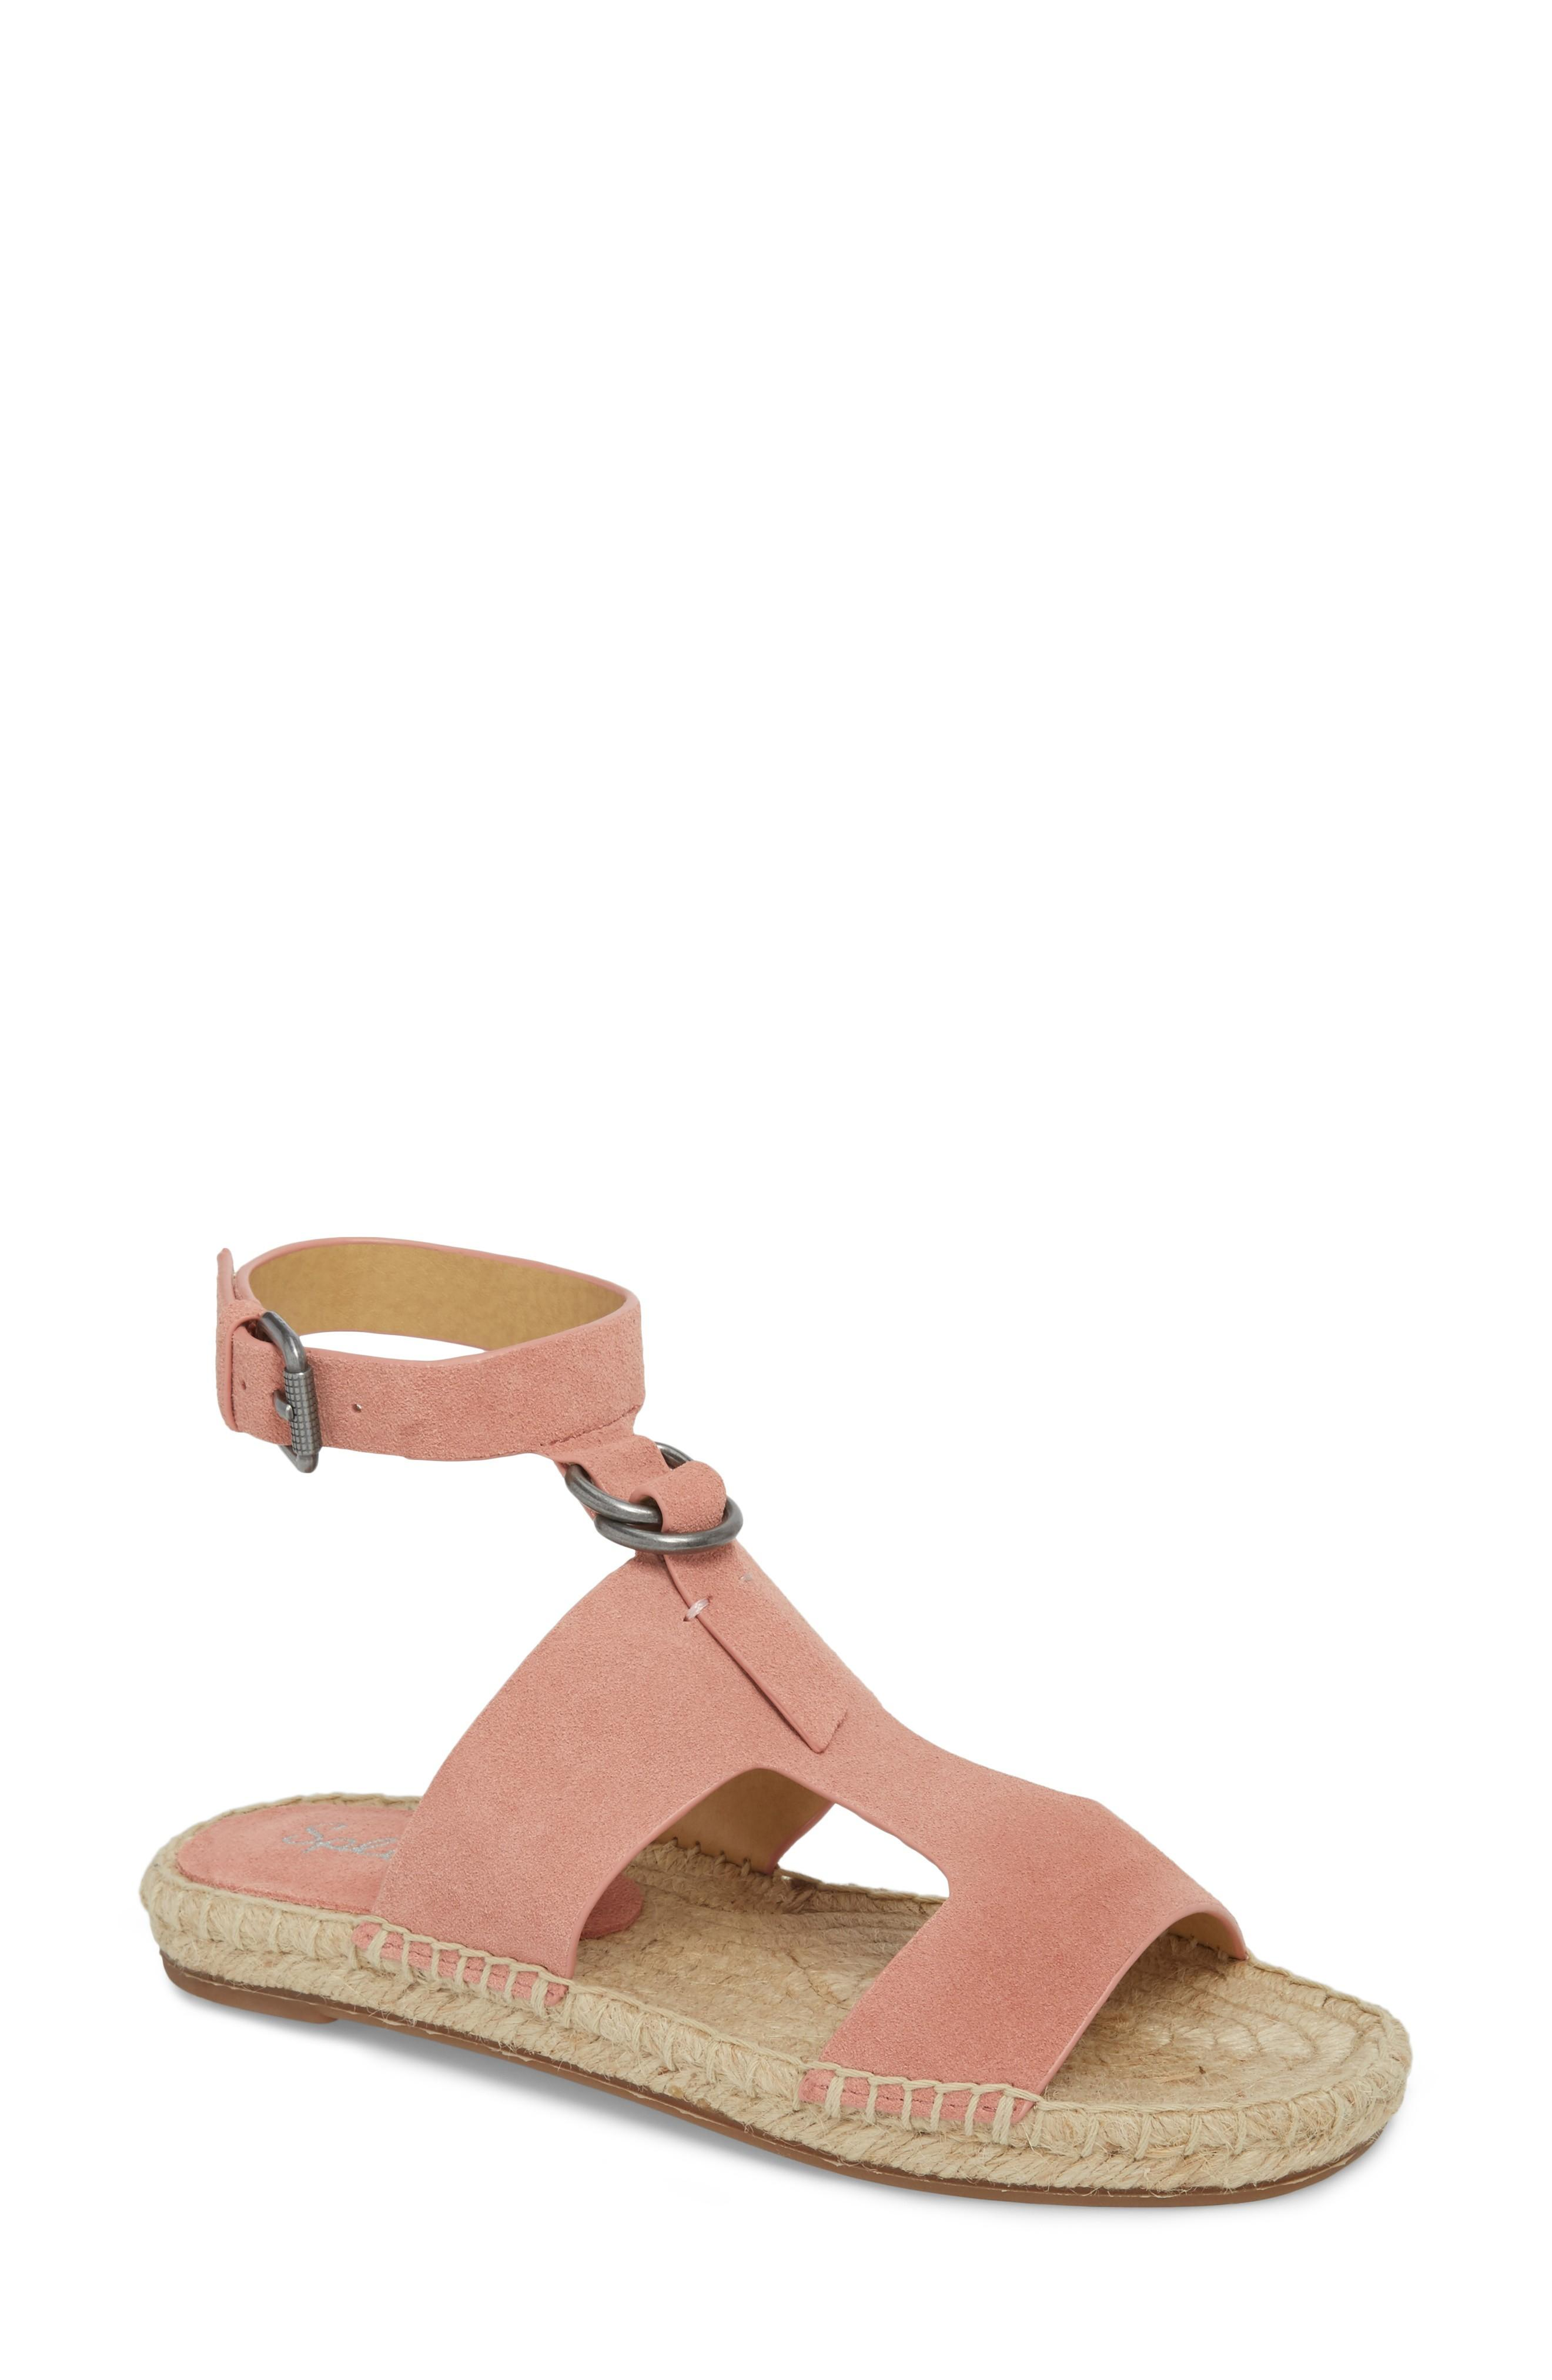 Splendid Farley Espadrille Sandal In Blush Suede